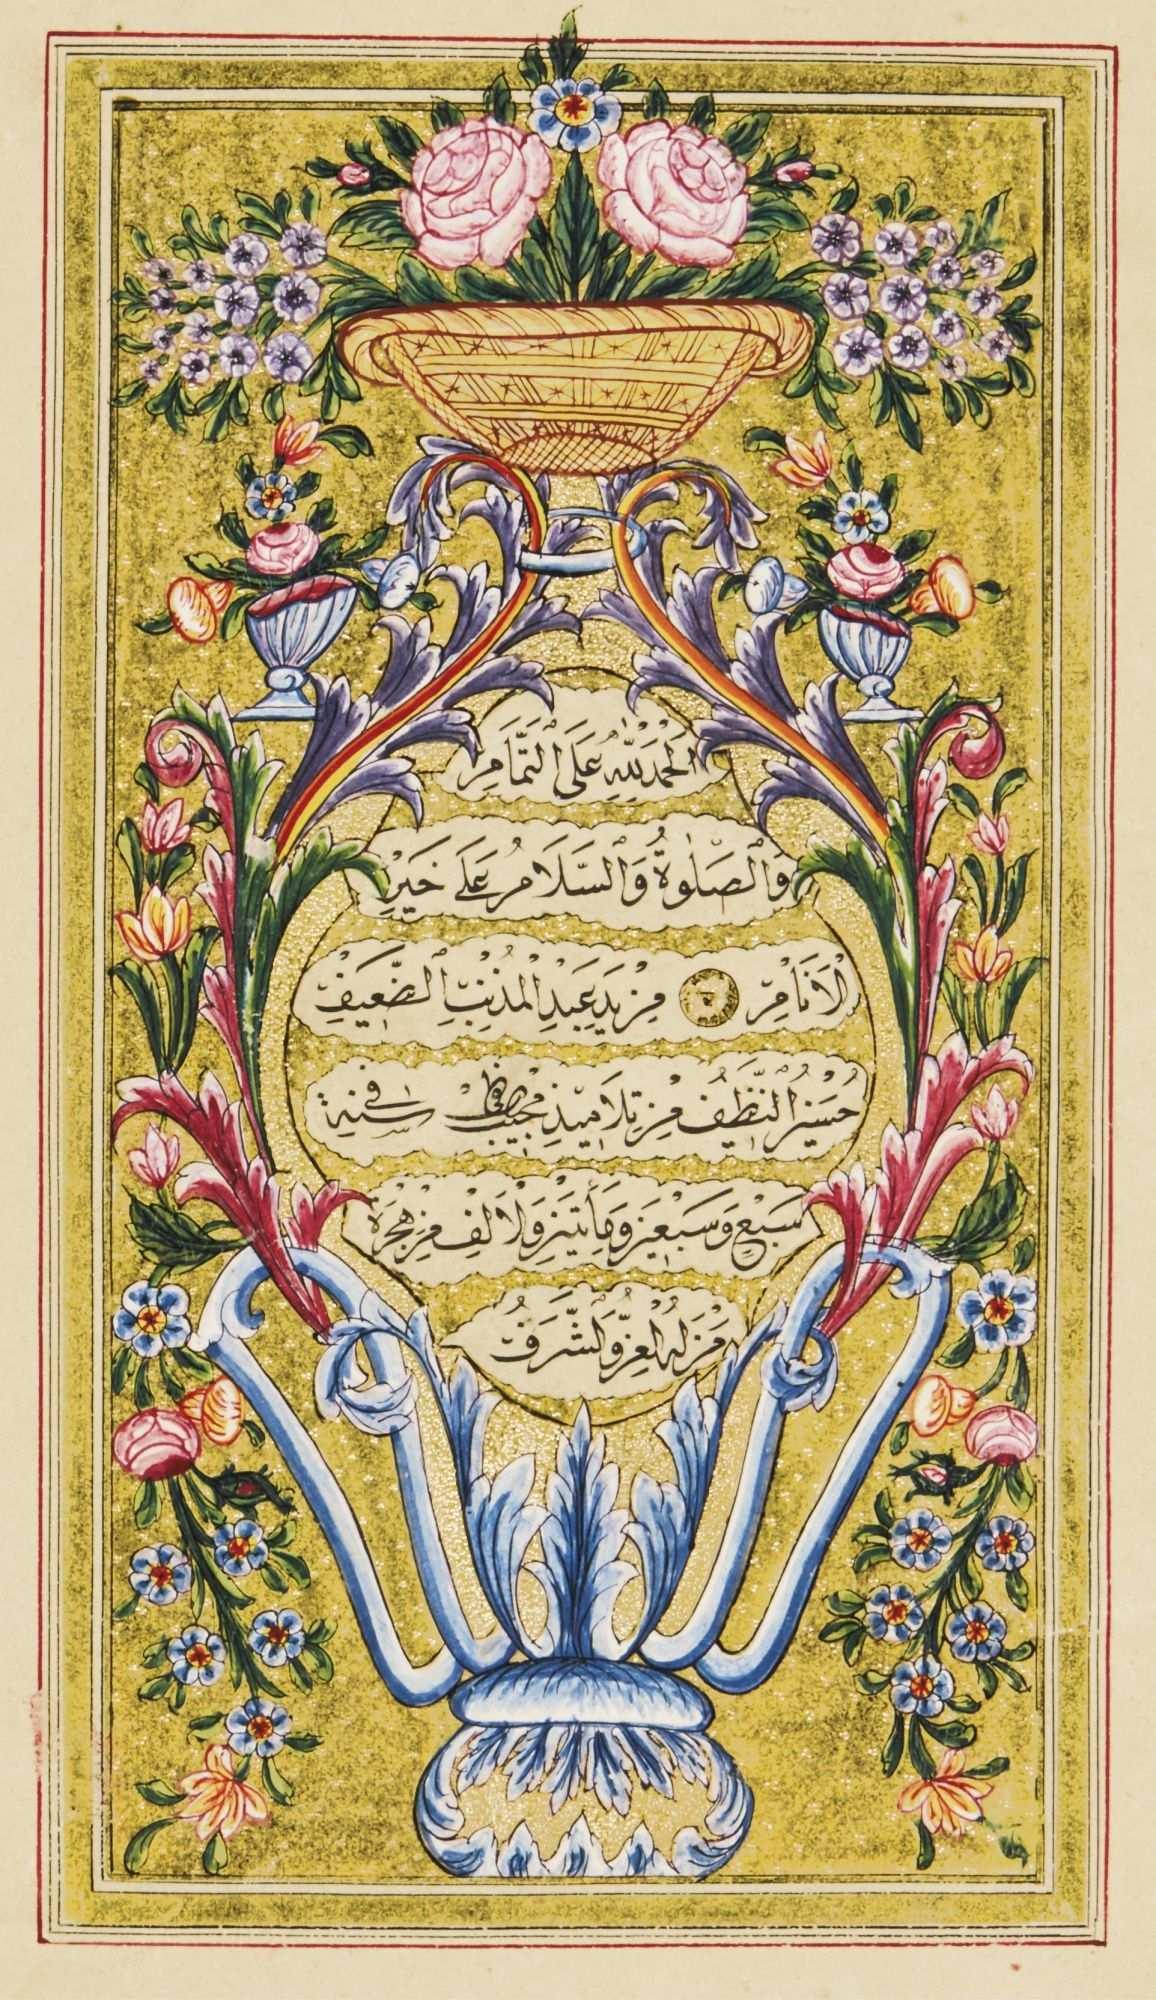 An Illuminated Ottoman Qur An Copied By Husayn Al Nazif Turkey Ottoman Dated 1277 Ah 1860 Ad Arabic Manuscript On Sanat Cicekler Tezhip Nadide Fotograflar